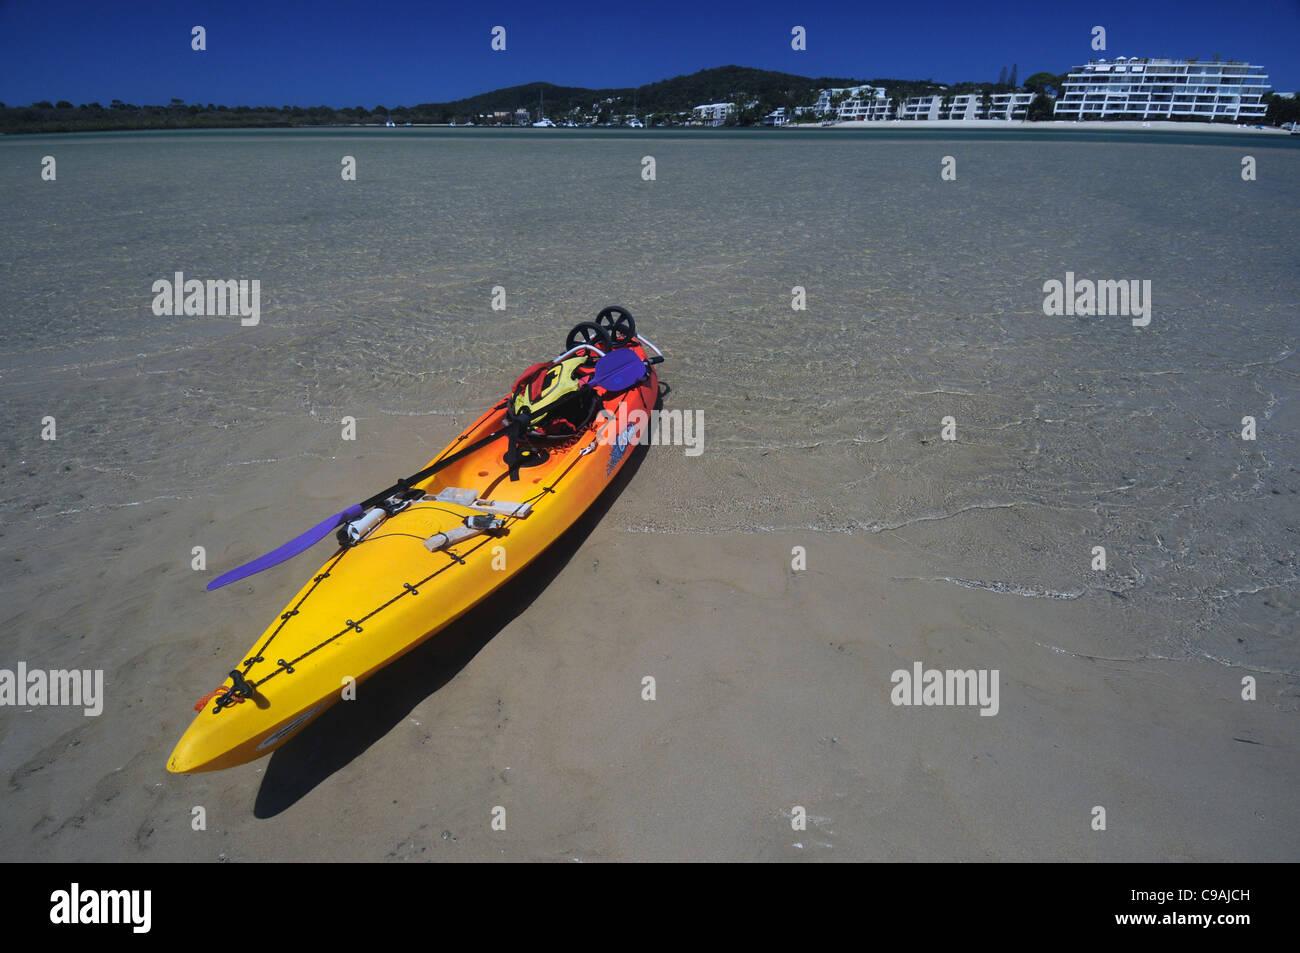 Kayak on sandbar in the Noosa River estuary, Sunshine Coast, Queensland, Australia. No PR - Stock Image